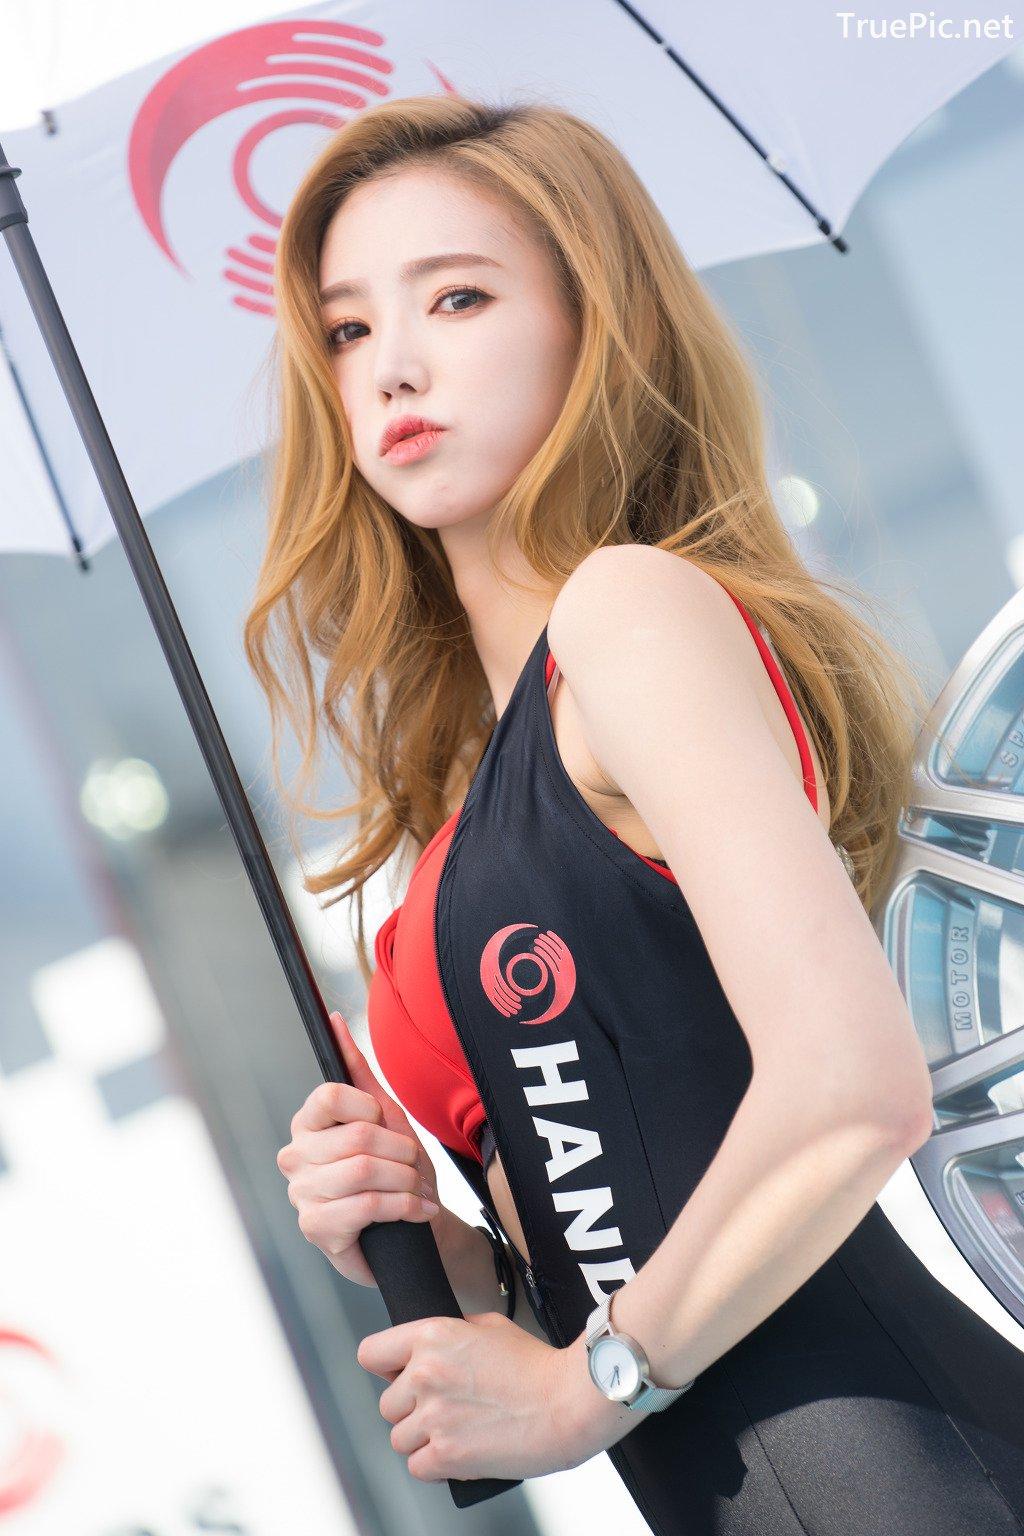 Image Korean Racing Model - Kim Bo Ra - Incheon Korea Tuning Festival - TruePic.net - Picture-4